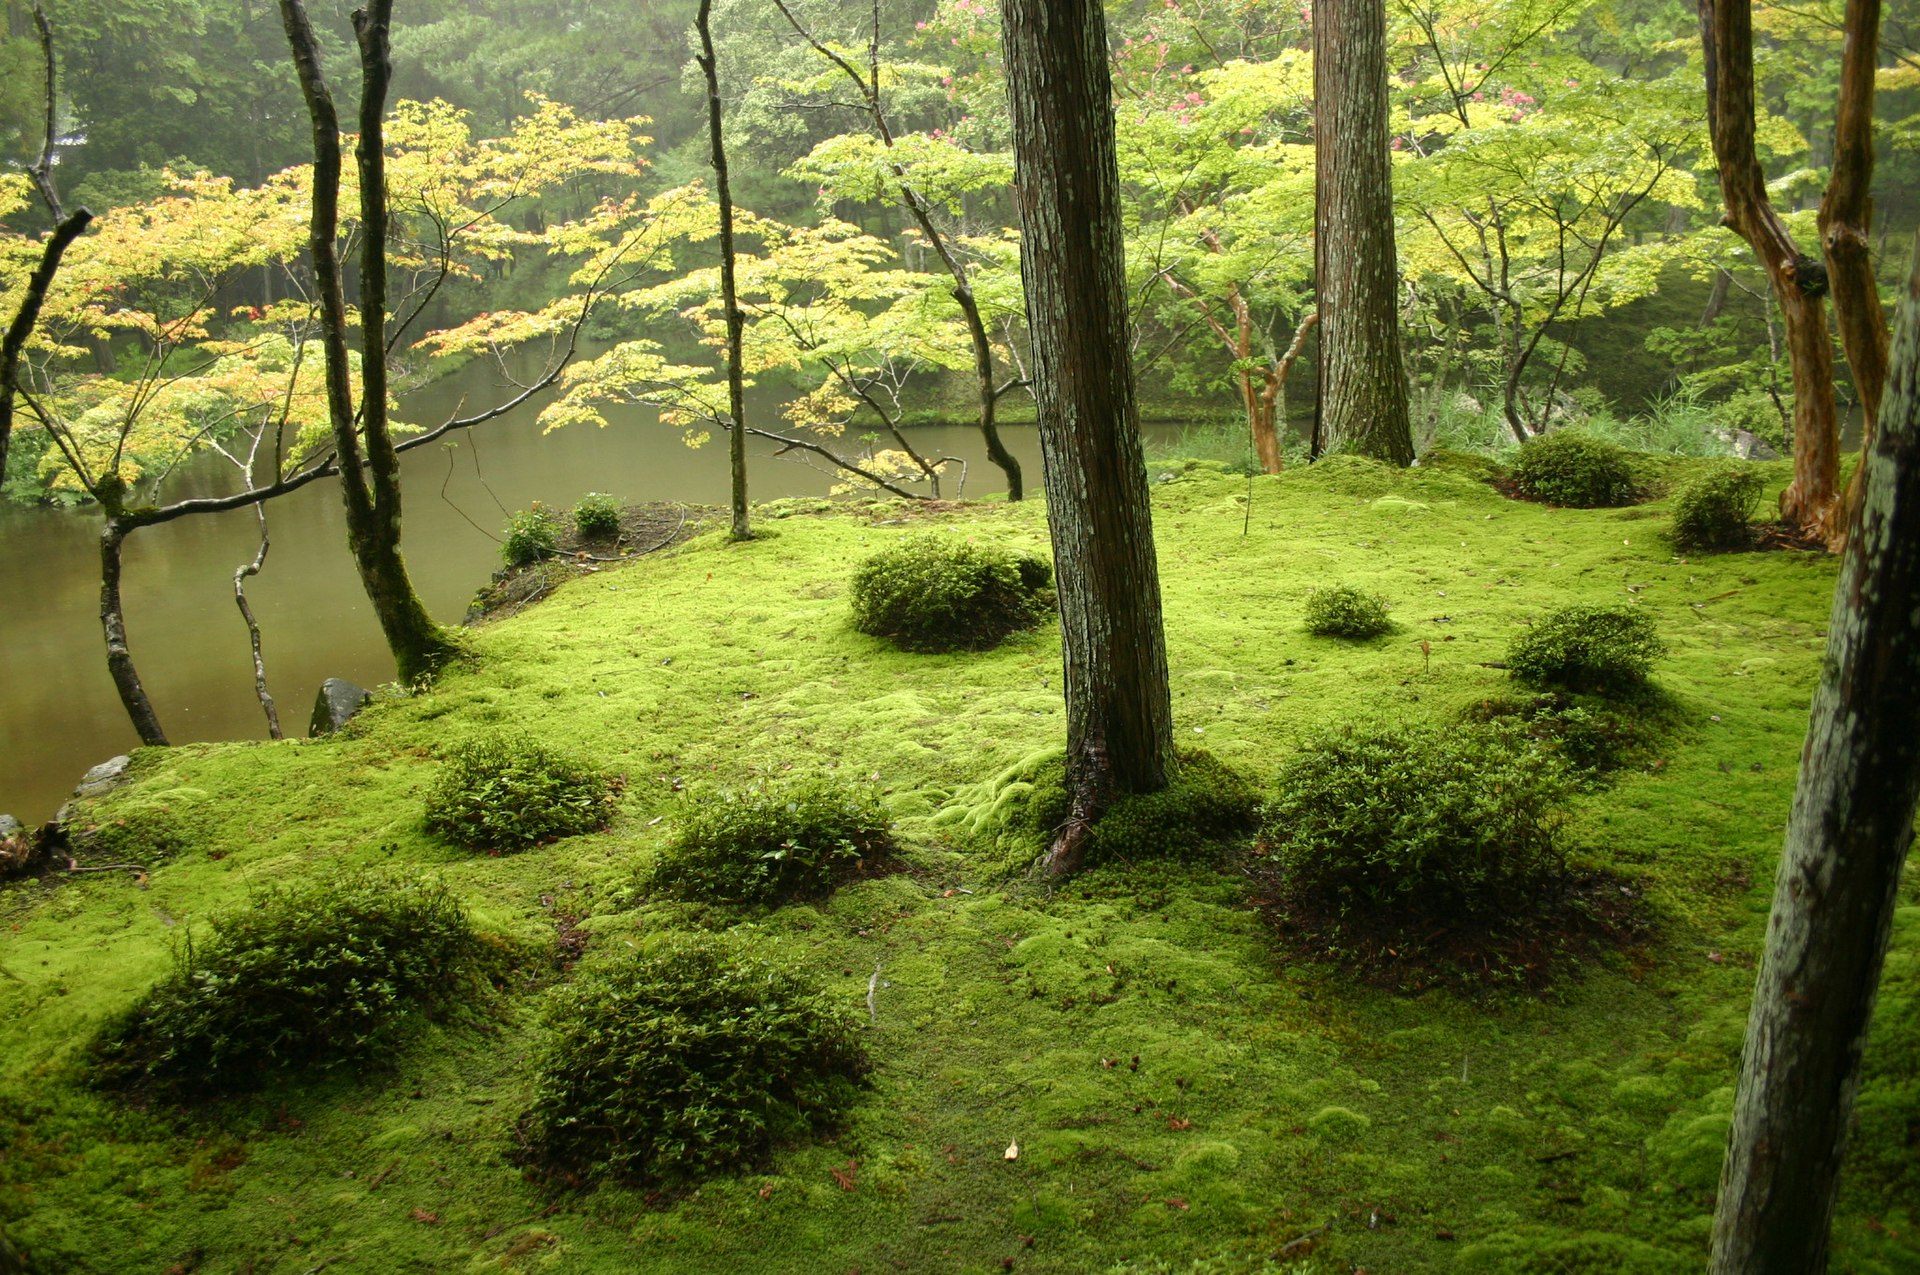 jardin japonais wikip dia